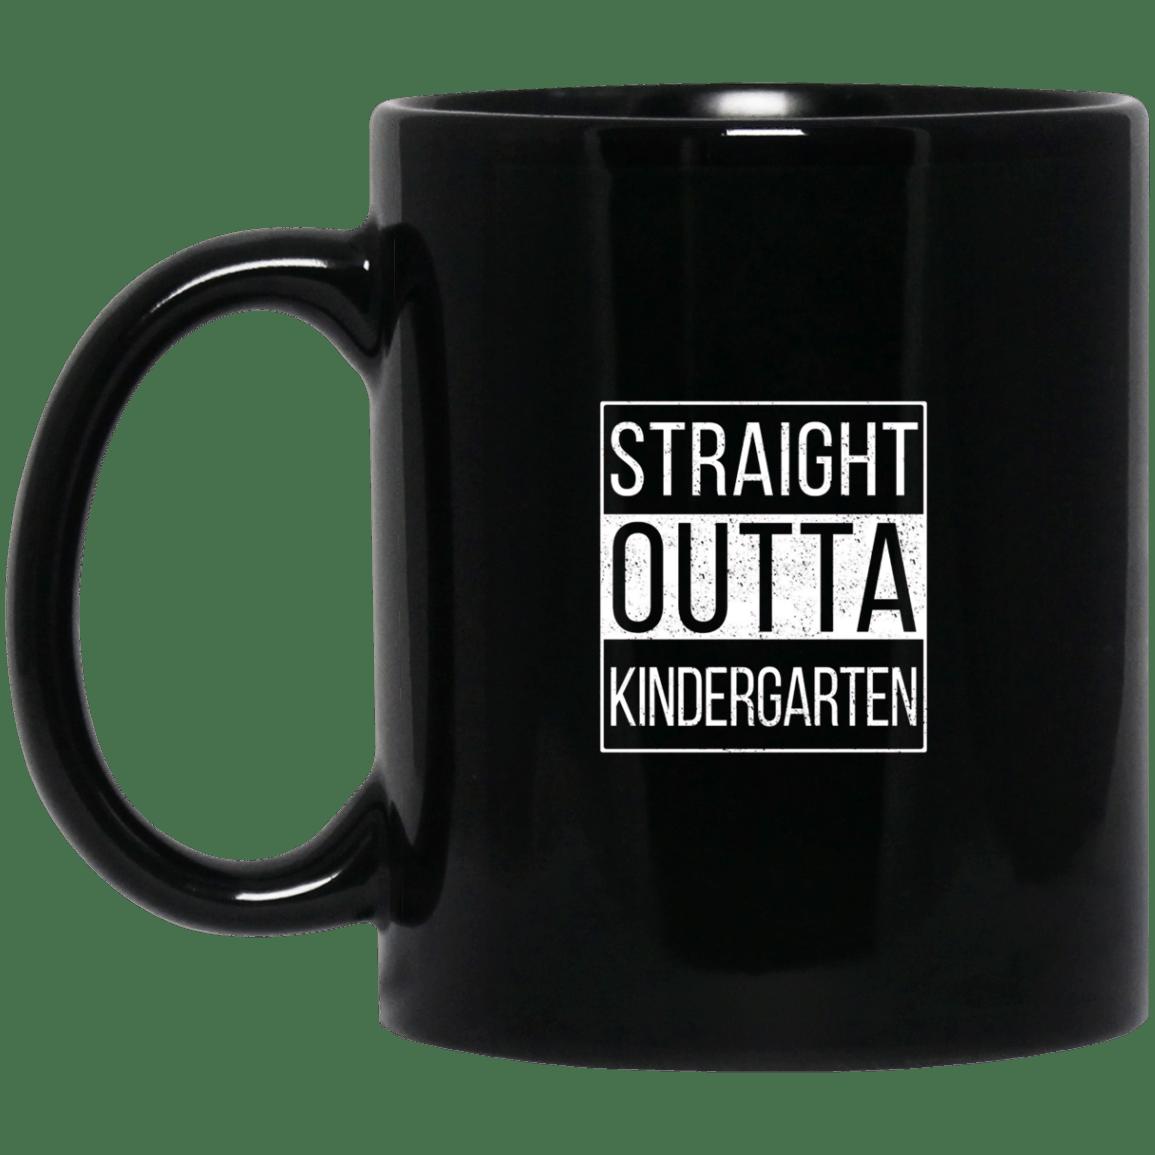 Straight outta kindergarten adult mug